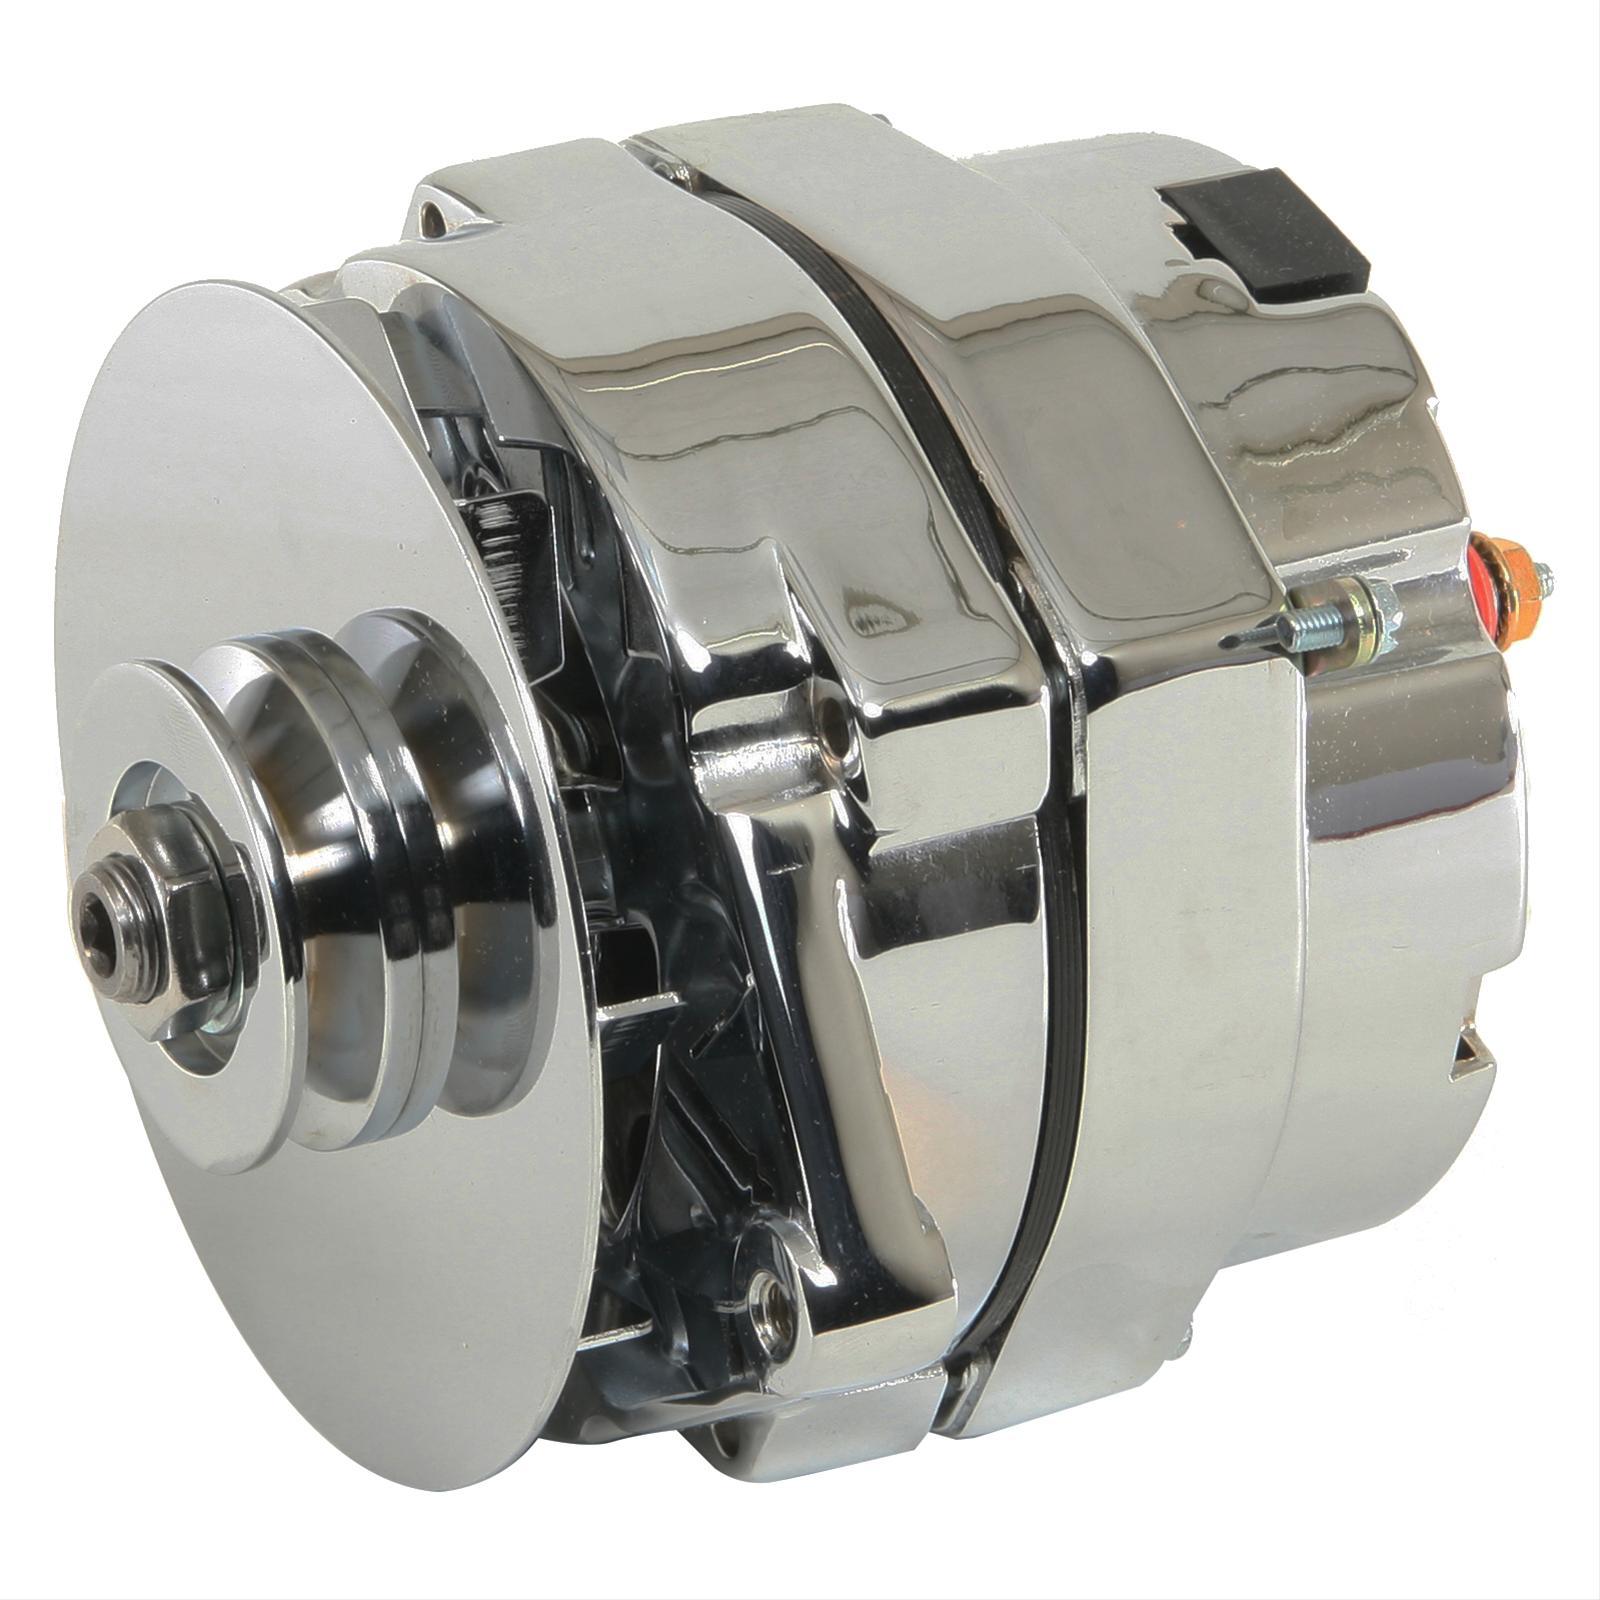 140 amp alternator wiring diagram gm